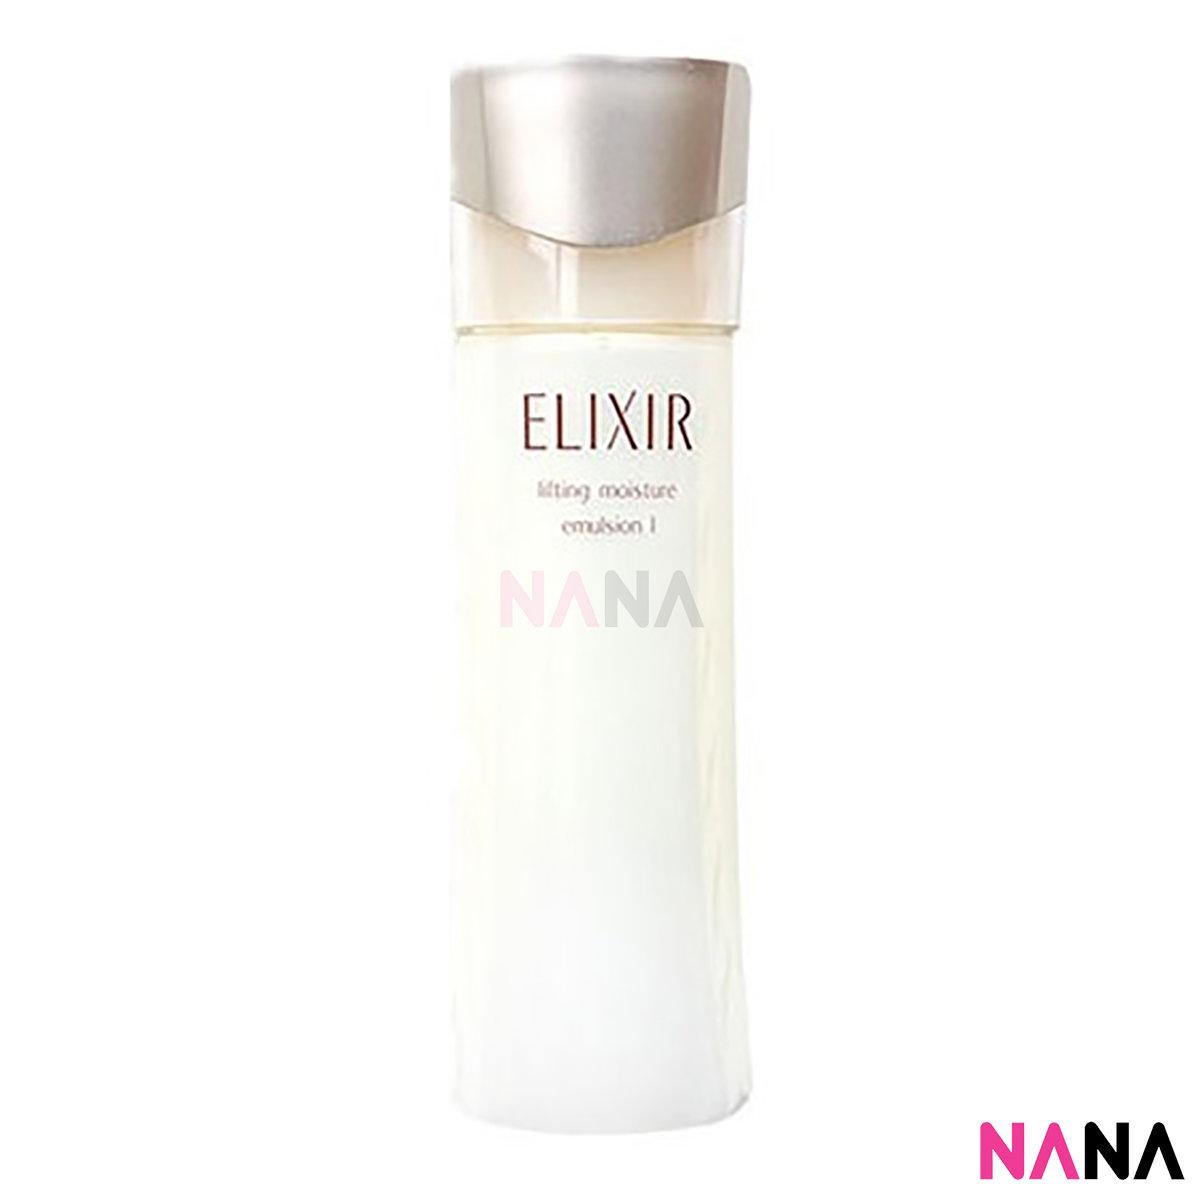 Elixir Skin Care By Age Lifting Moisture Emulsion I 130ml